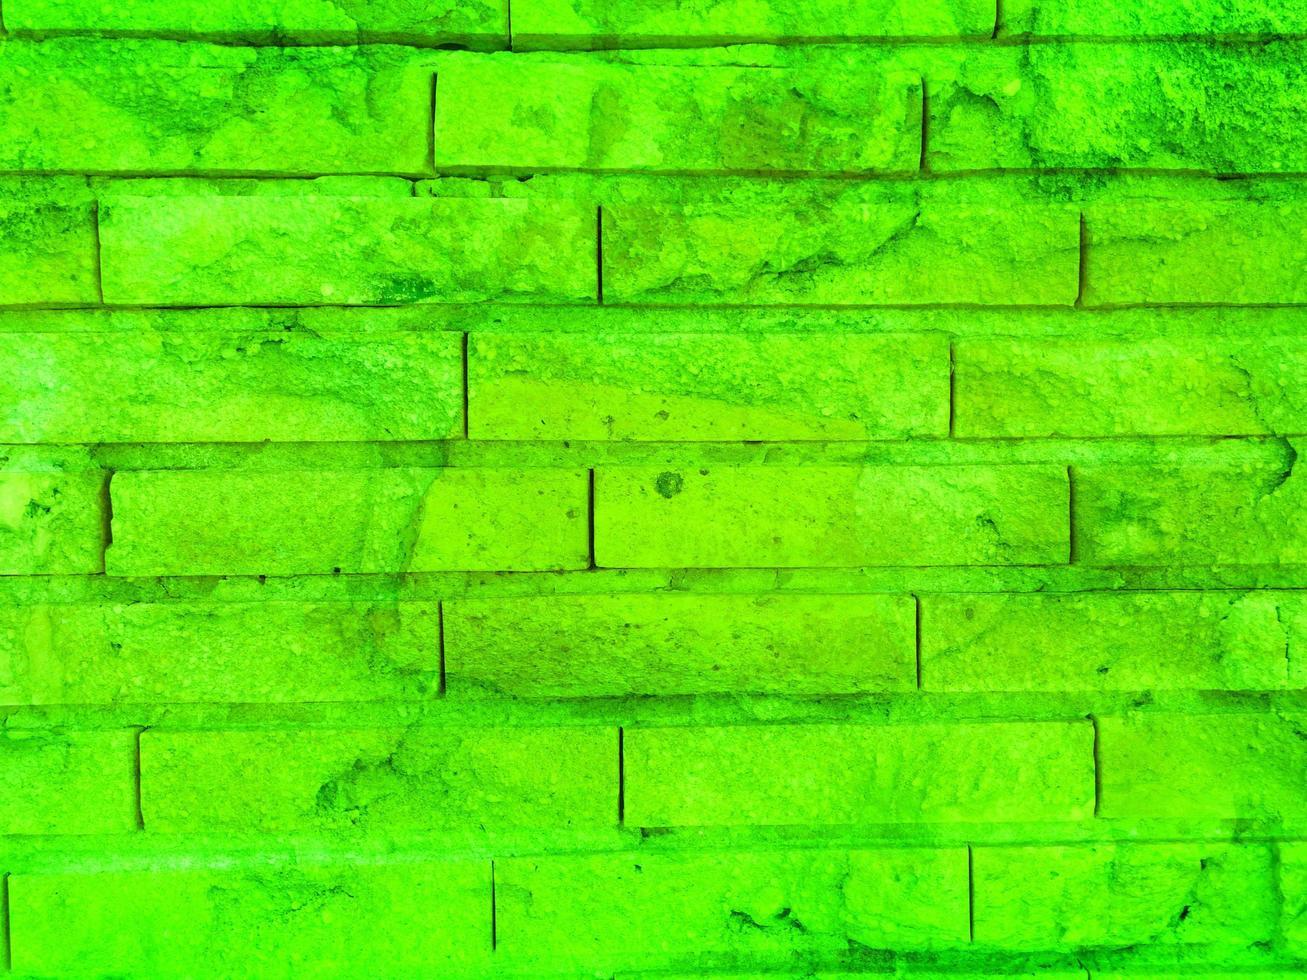 texture de pierre verte photo